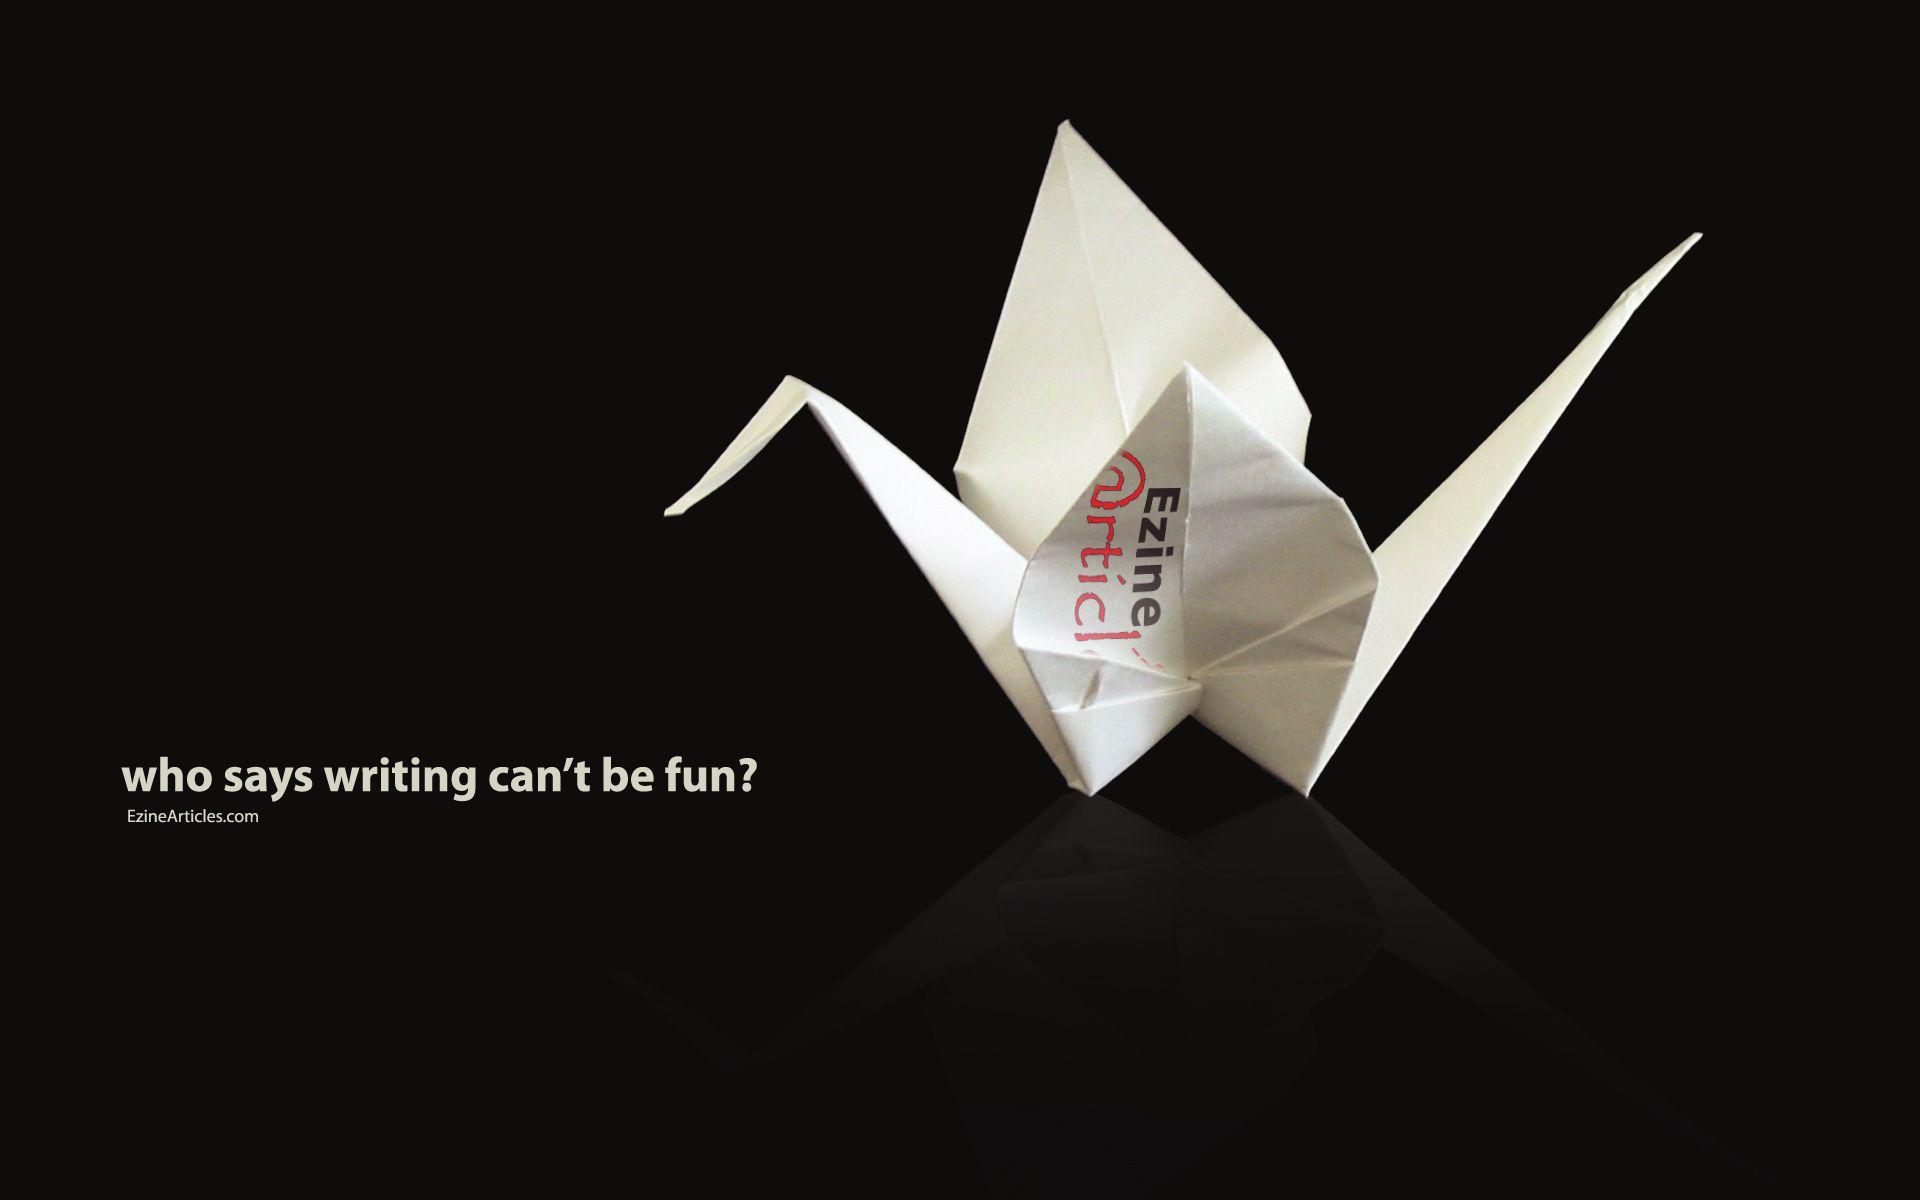 origami free wallpaper - photo #27